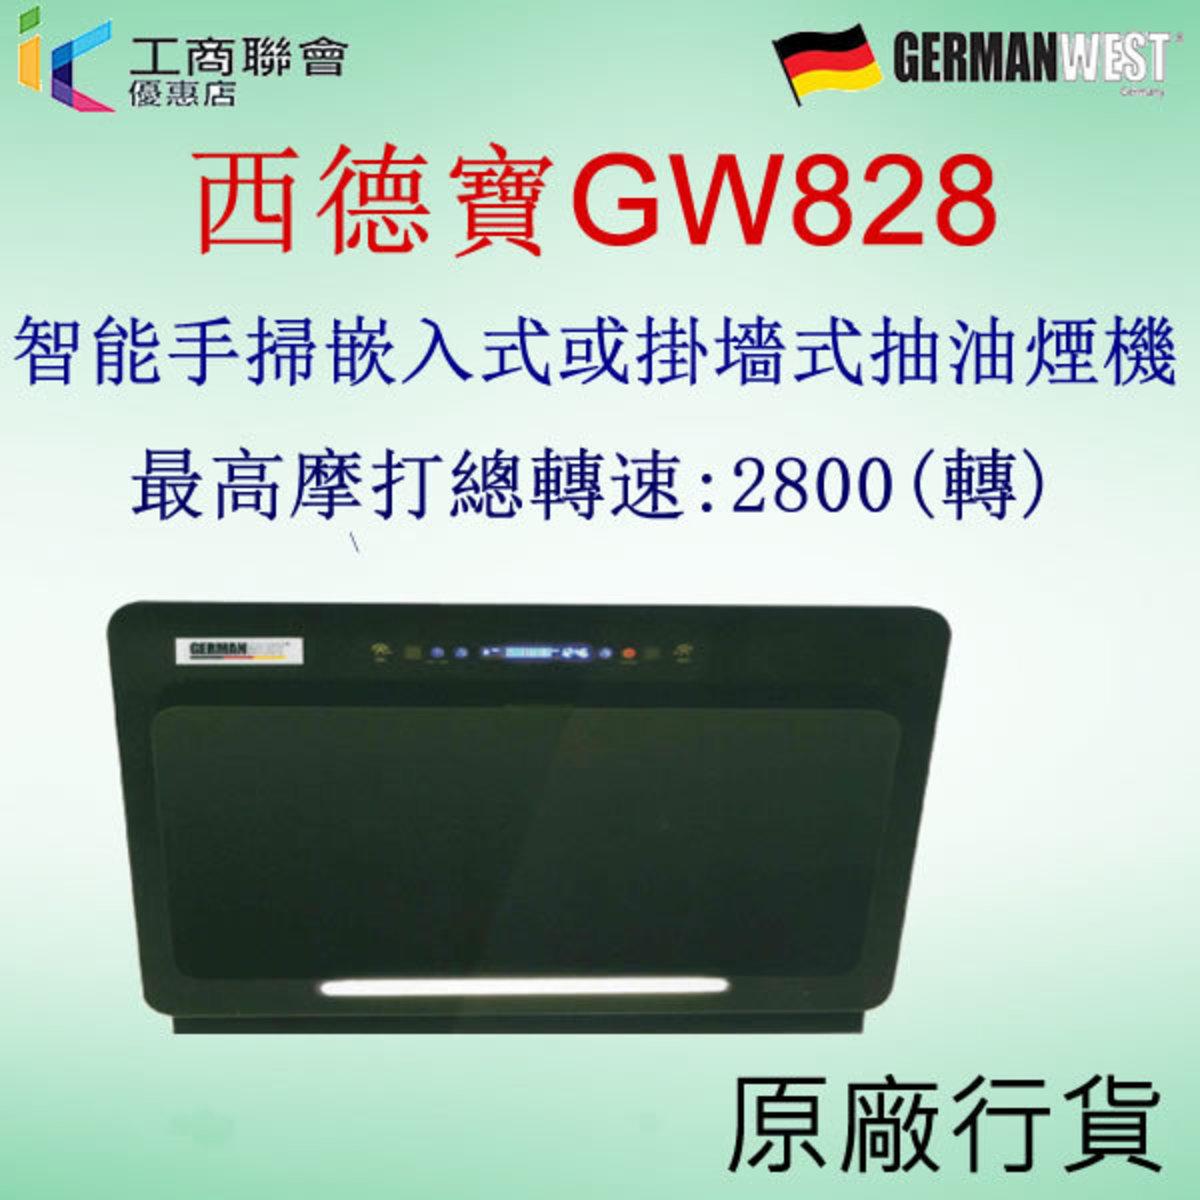 GW828 70厘米 傾斜式易拆抽油煙機 (智能手掃設計)